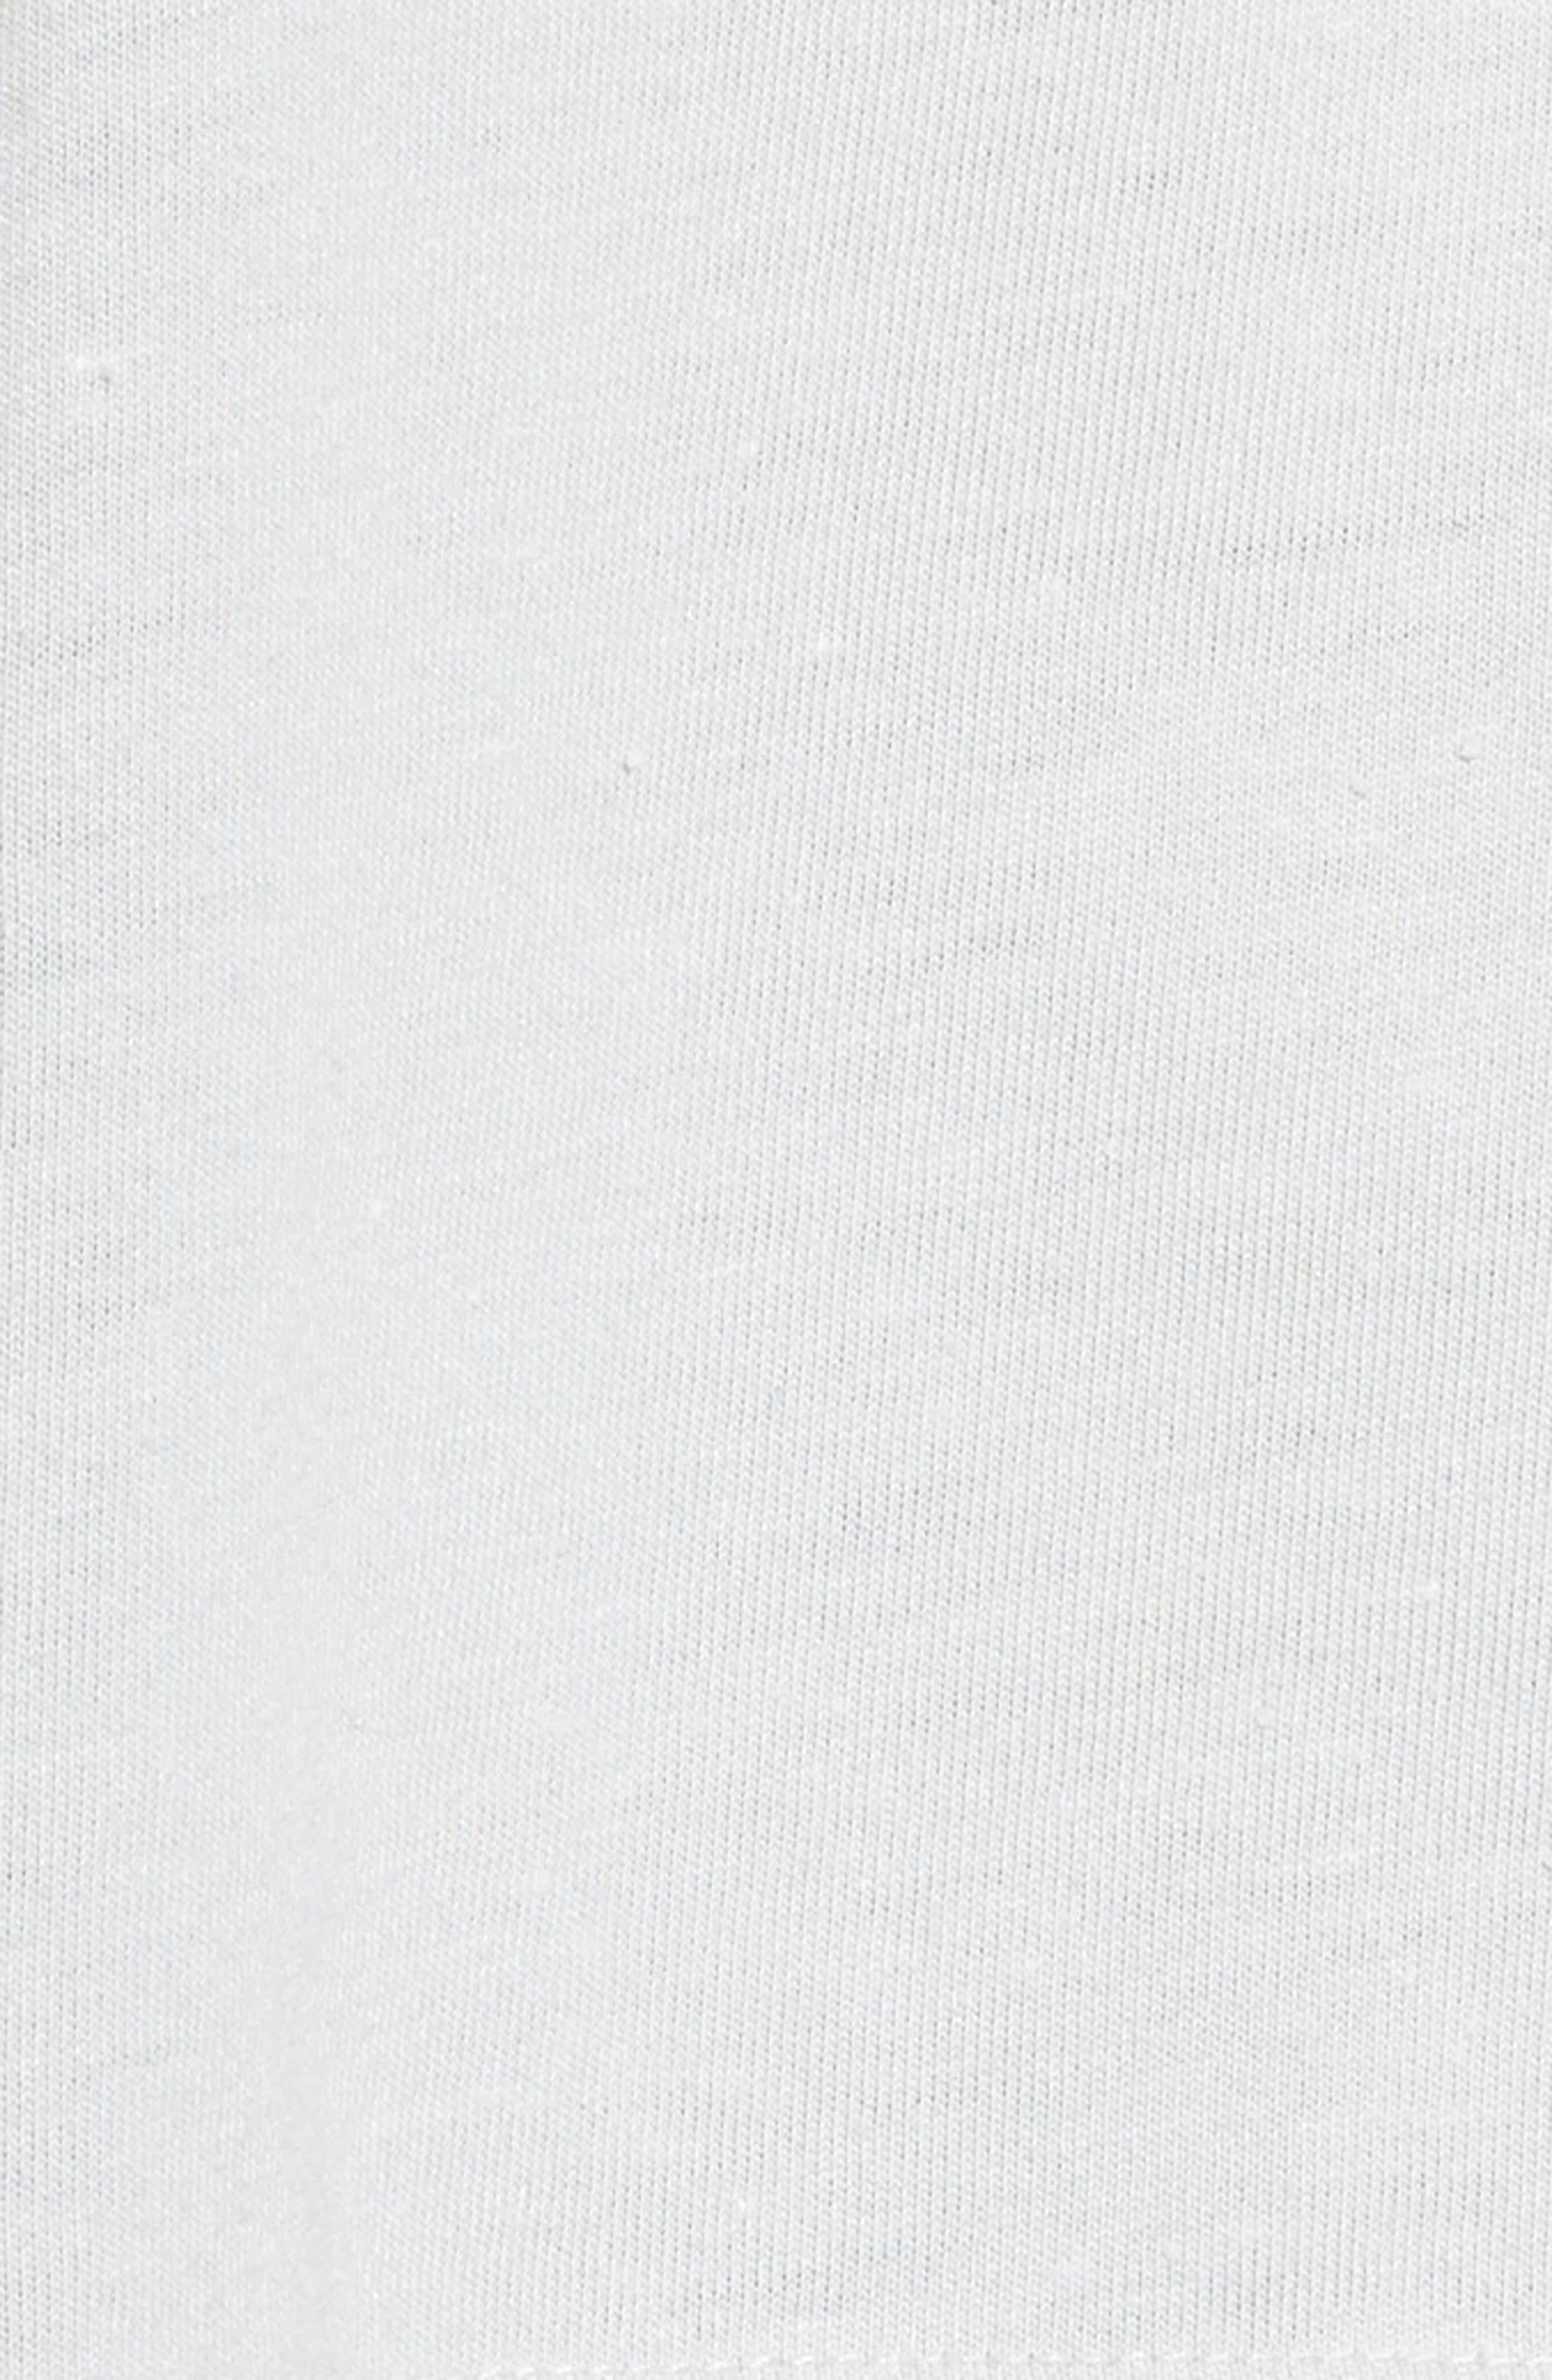 Logo Crop Tee,                             Alternate thumbnail 15, color,